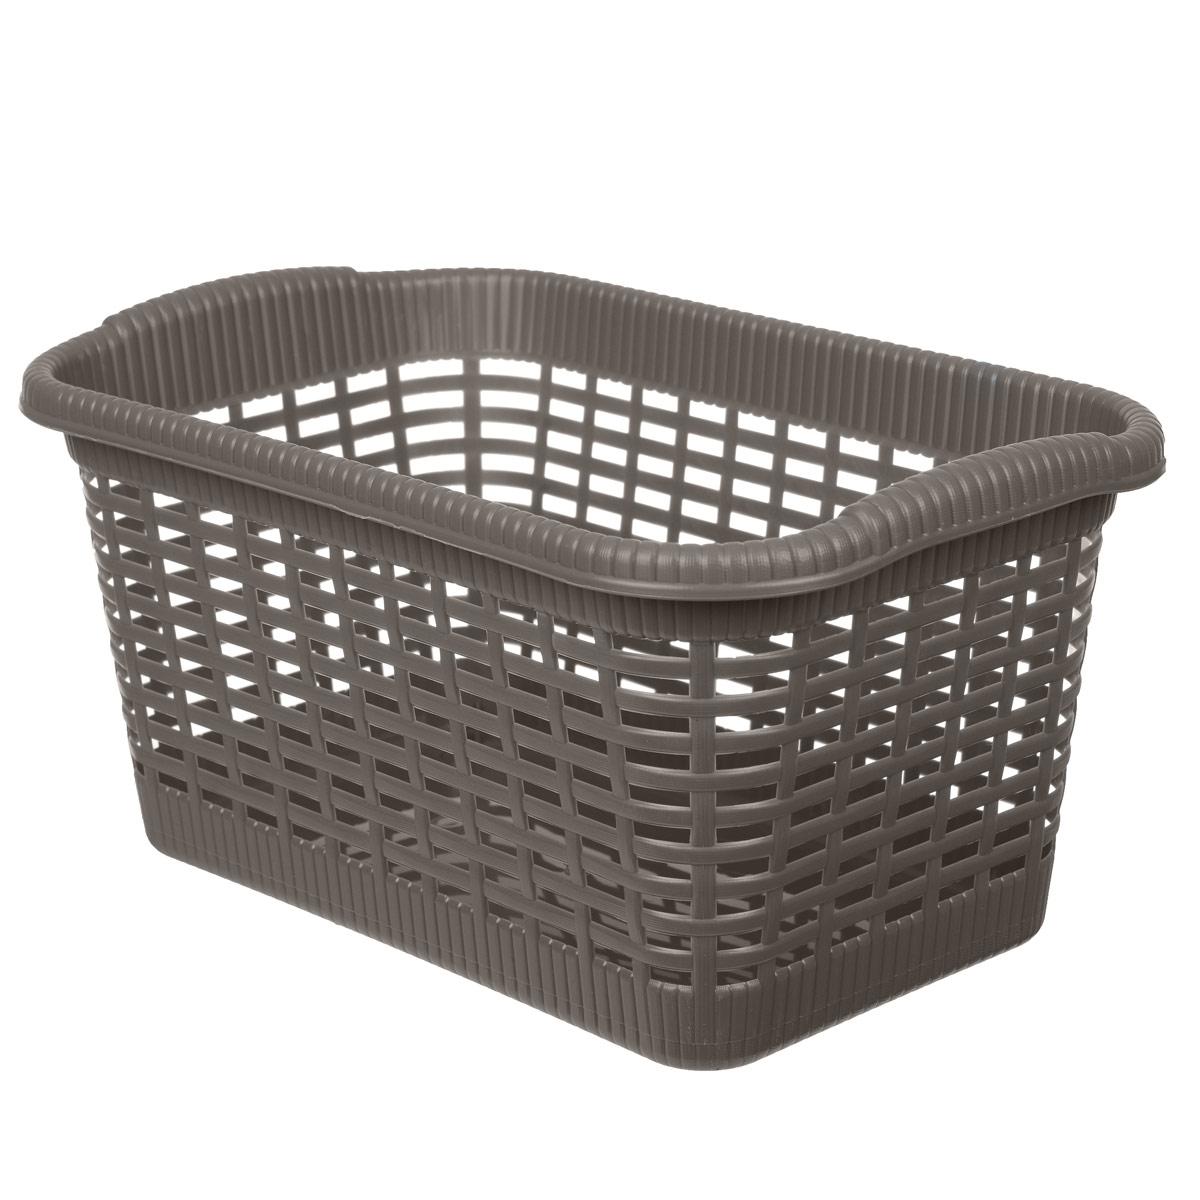 Корзина хозяйственная Gensini, цвет: коричневый, 36 x 22,5 x 18 см корзина складная outwell folding basket цвет зеленый 50 x 29 x 25 см